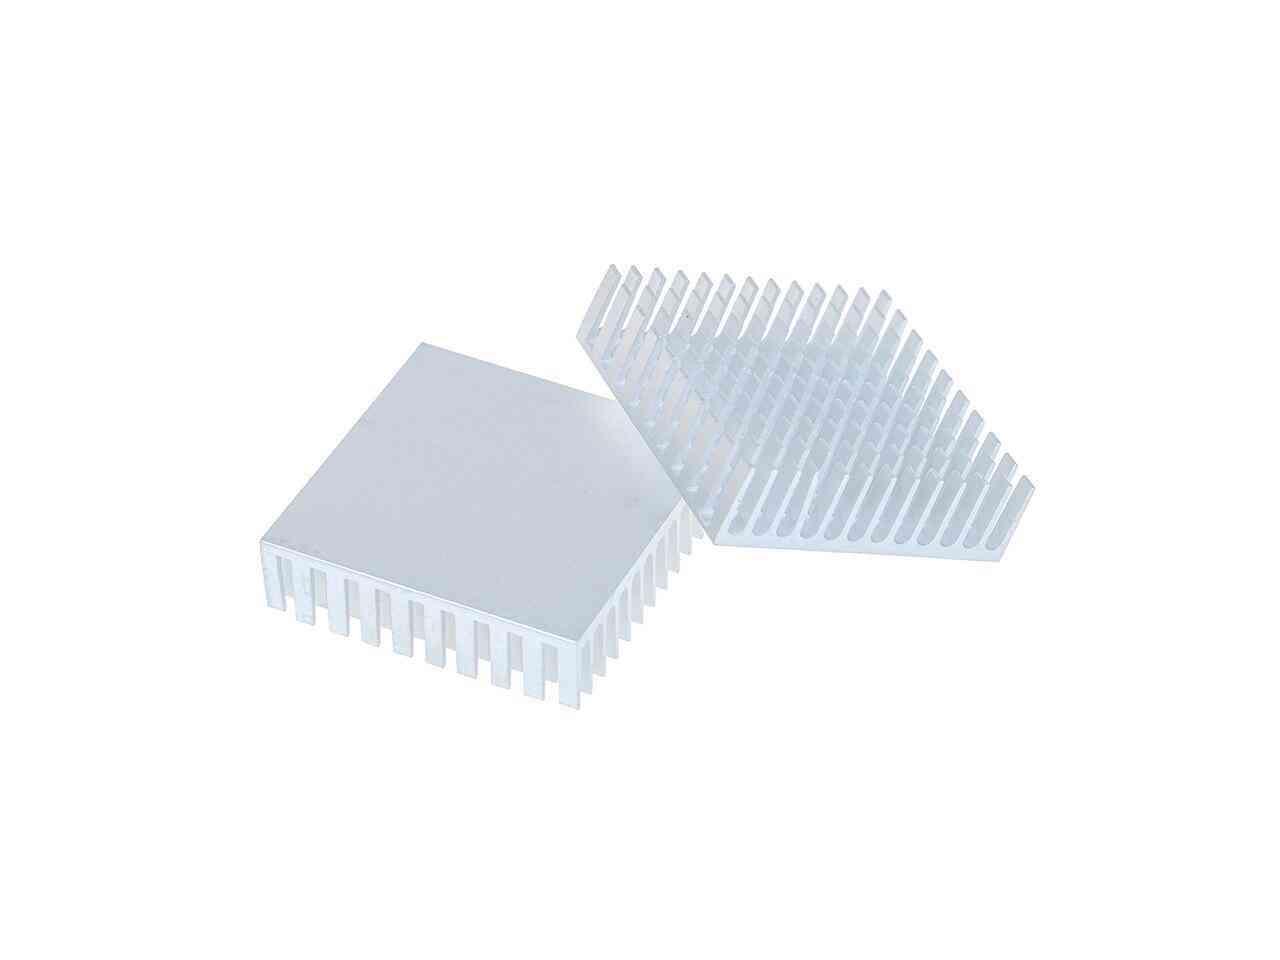 Heatsink Cooling Fin - Aluminum Radiator Cooler For Ic Chip